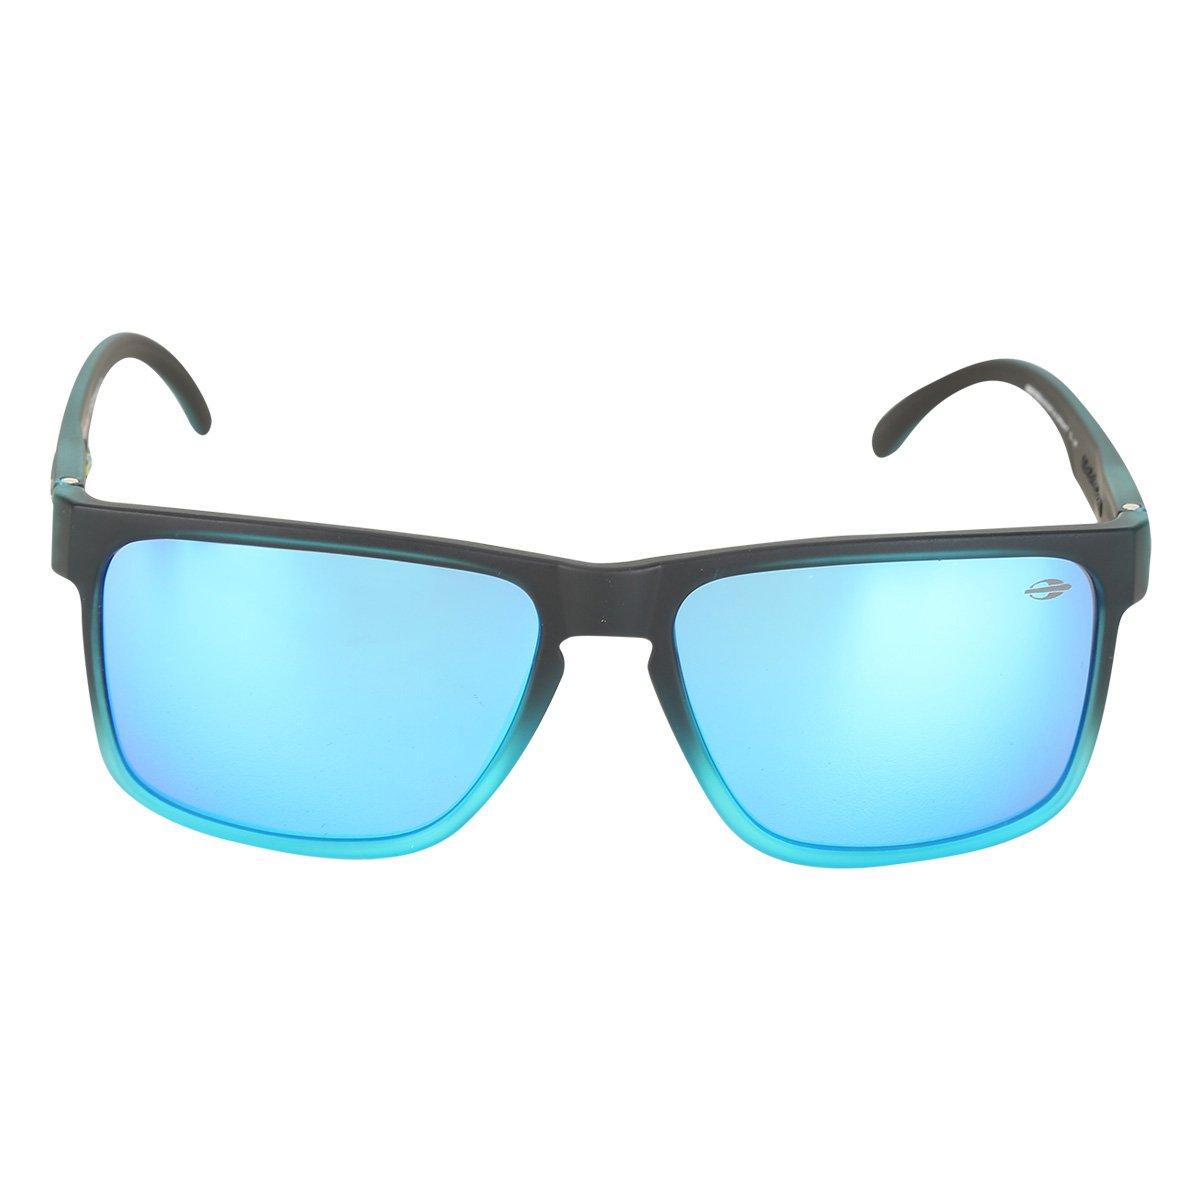 Óculos de Sol Mormaii Monterey Masculino - Compre Agora   Zattini bcbb34370e